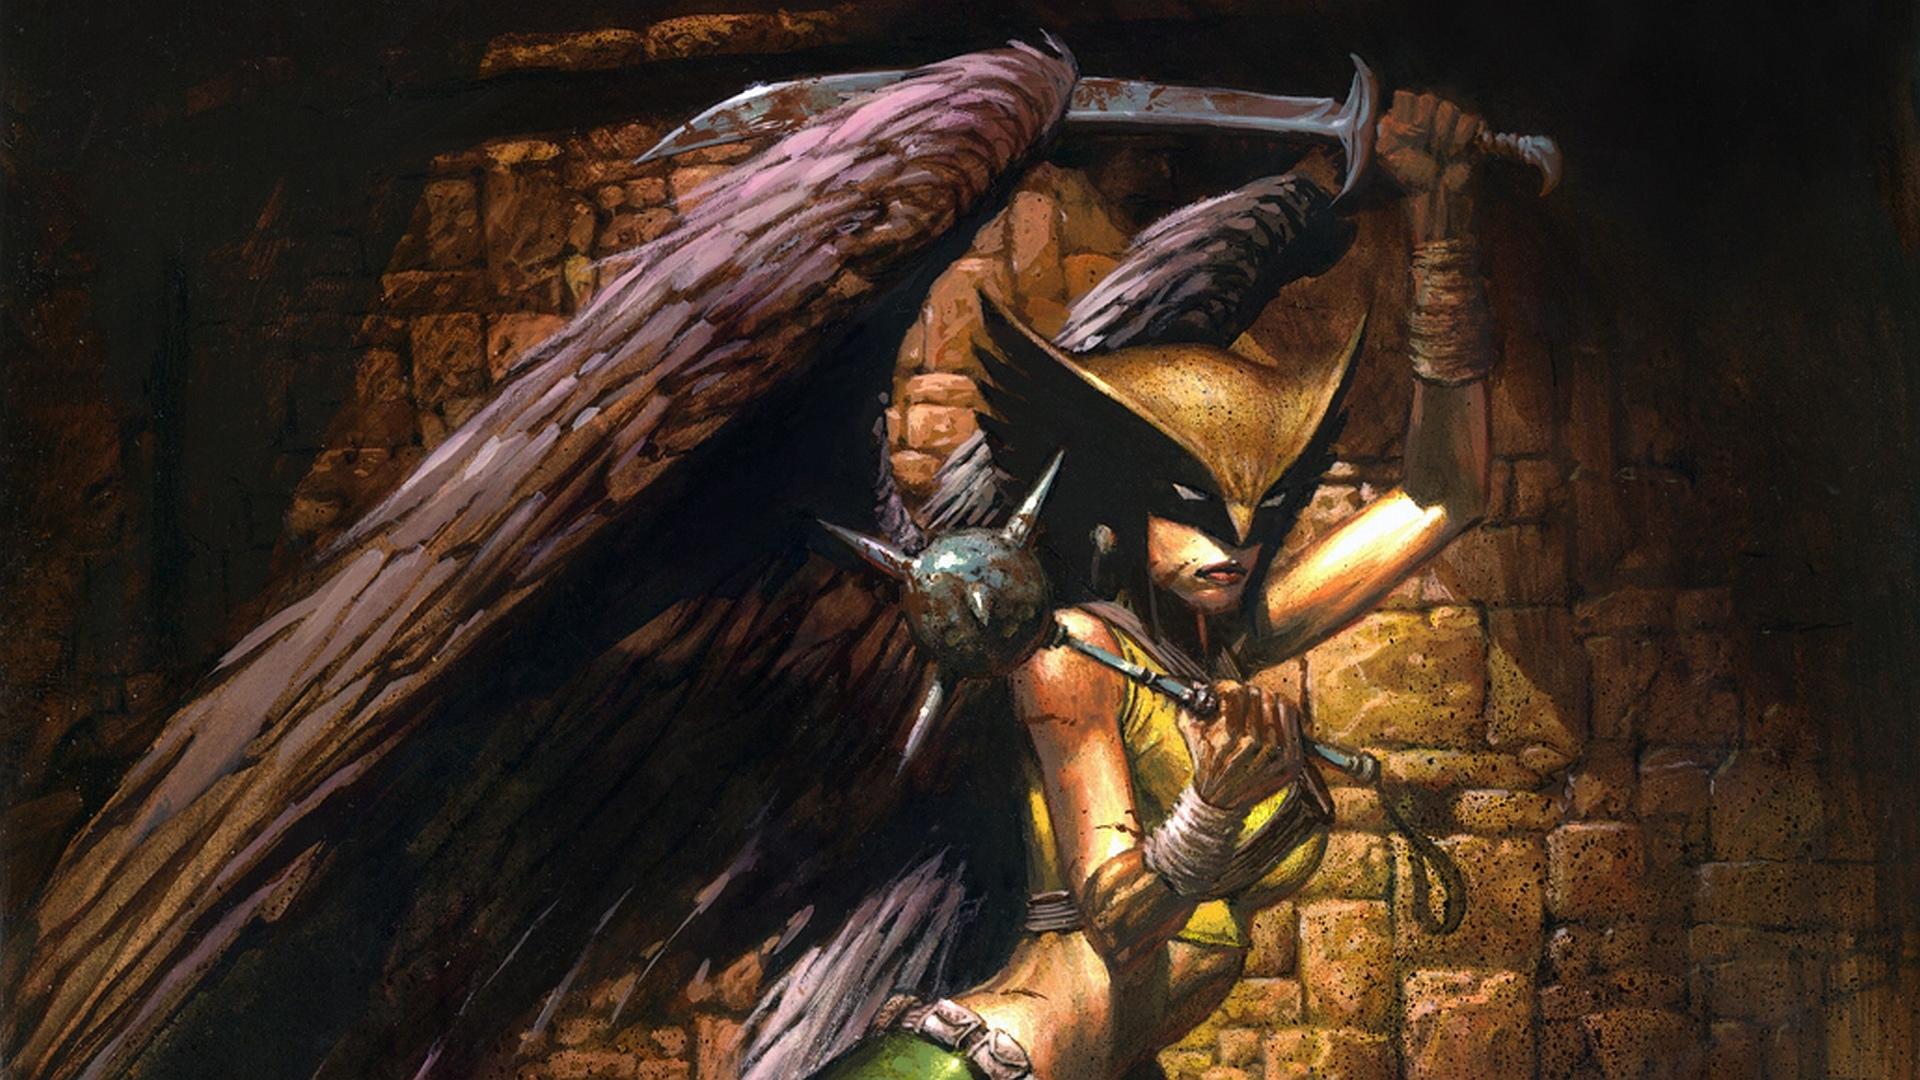 Hawkgirl Comics wallpapers HD quality